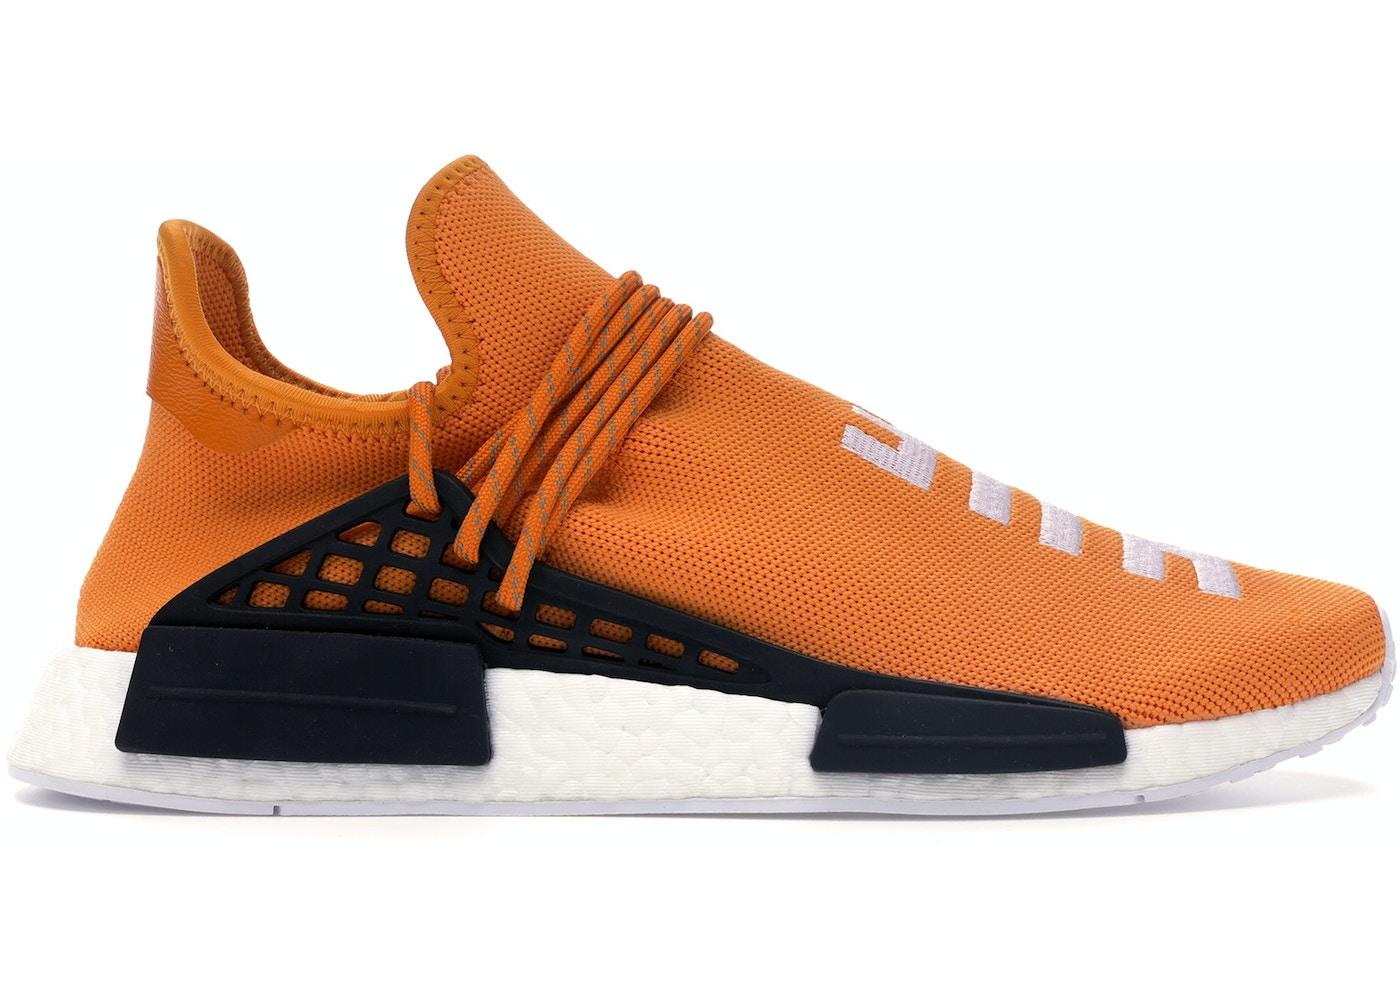 adidas NMD R1 Pharrell HU Hue Man Tangerine - BB3070